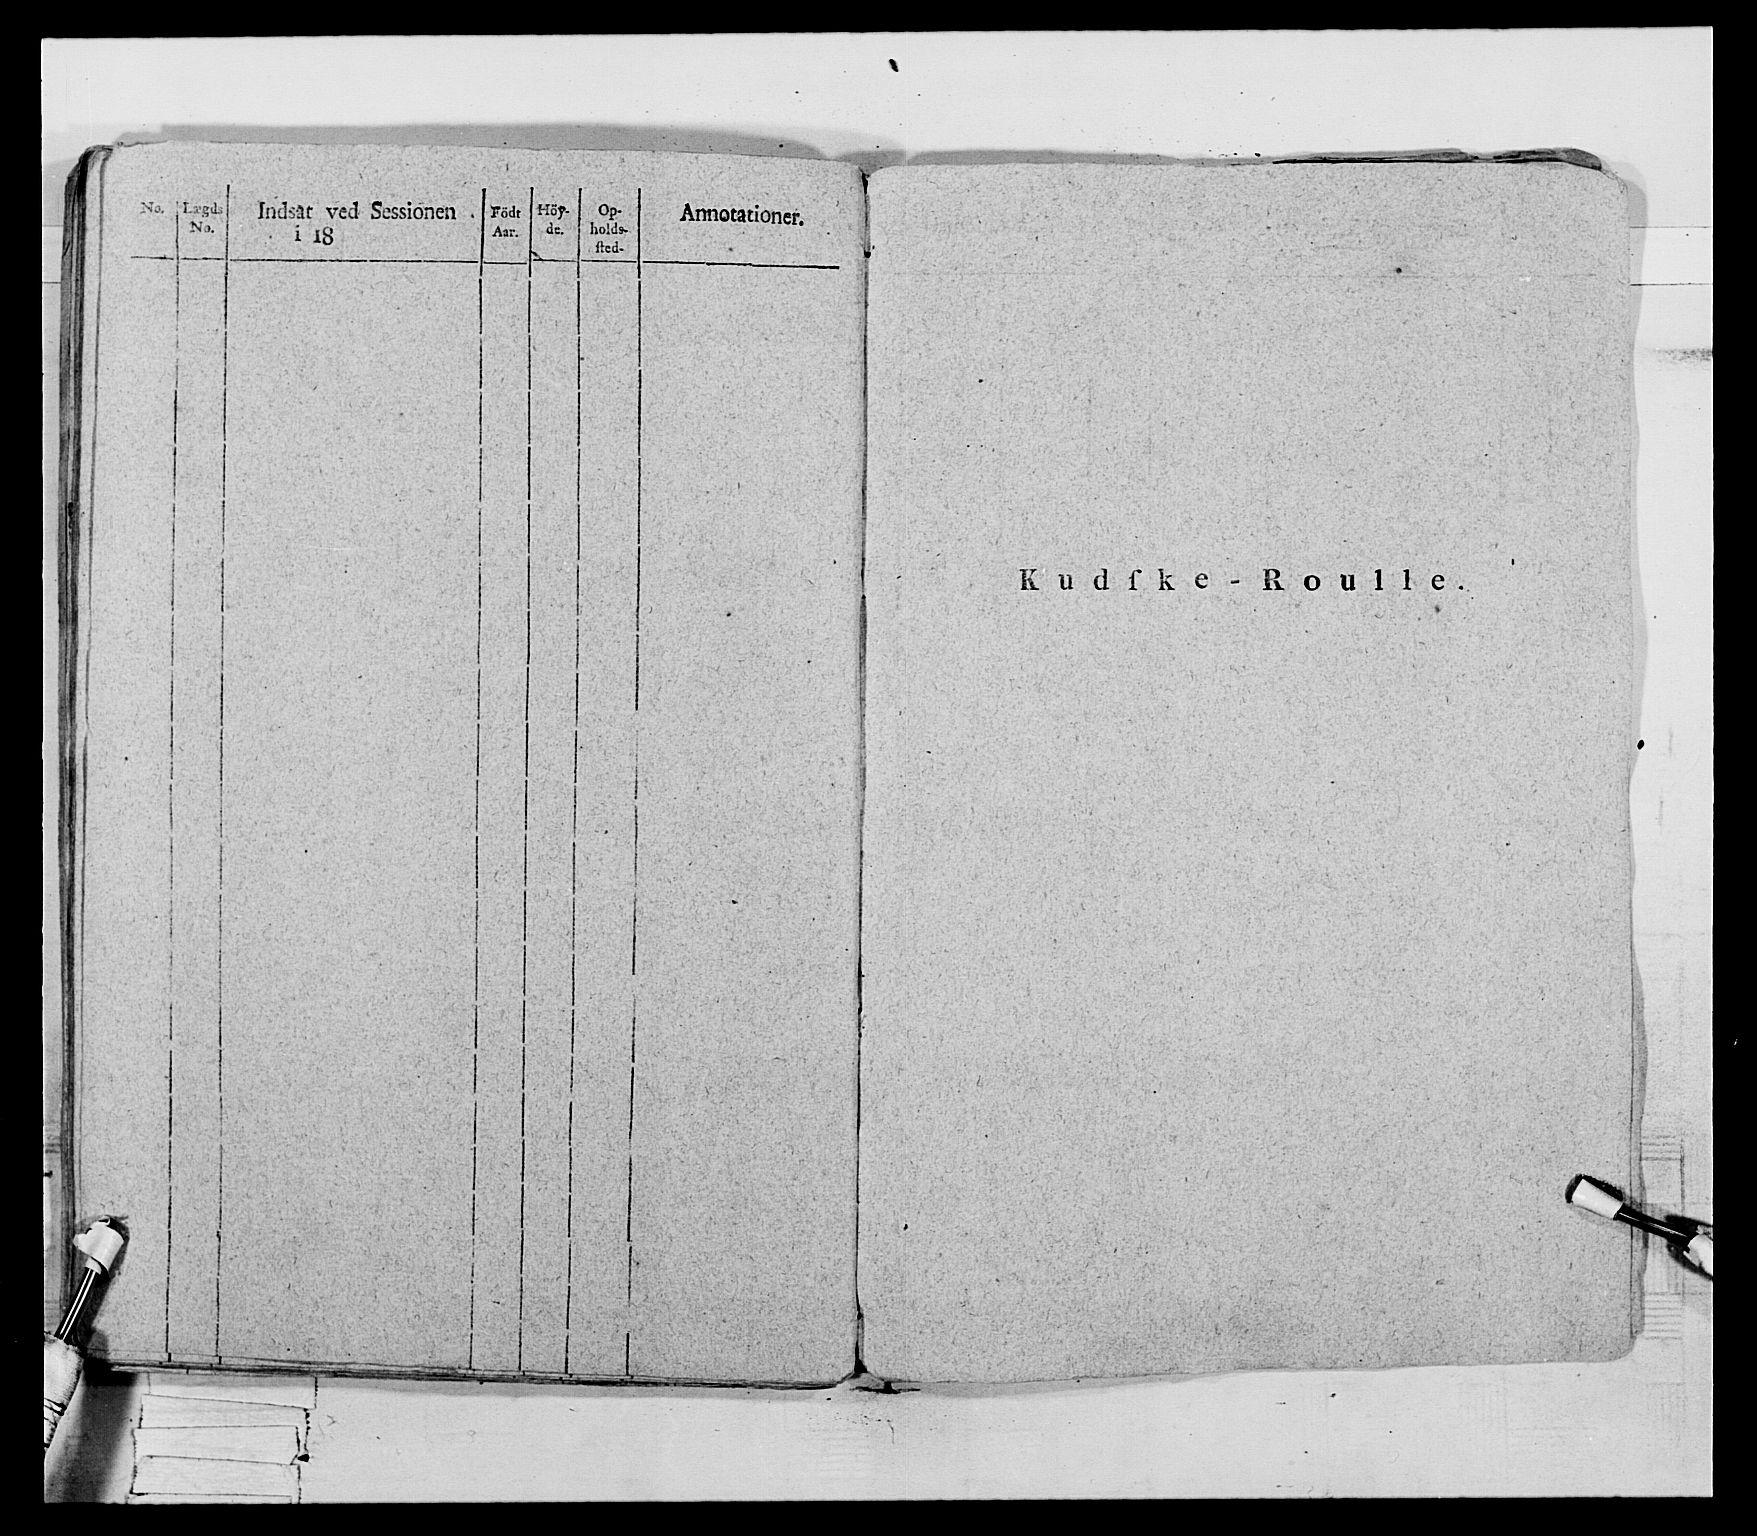 RA, Generalitets- og kommissariatskollegiet, Det kongelige norske kommissariatskollegium, E/Eh/L0069: Opplandske gevorbne infanteriregiment, 1810-1818, p. 103